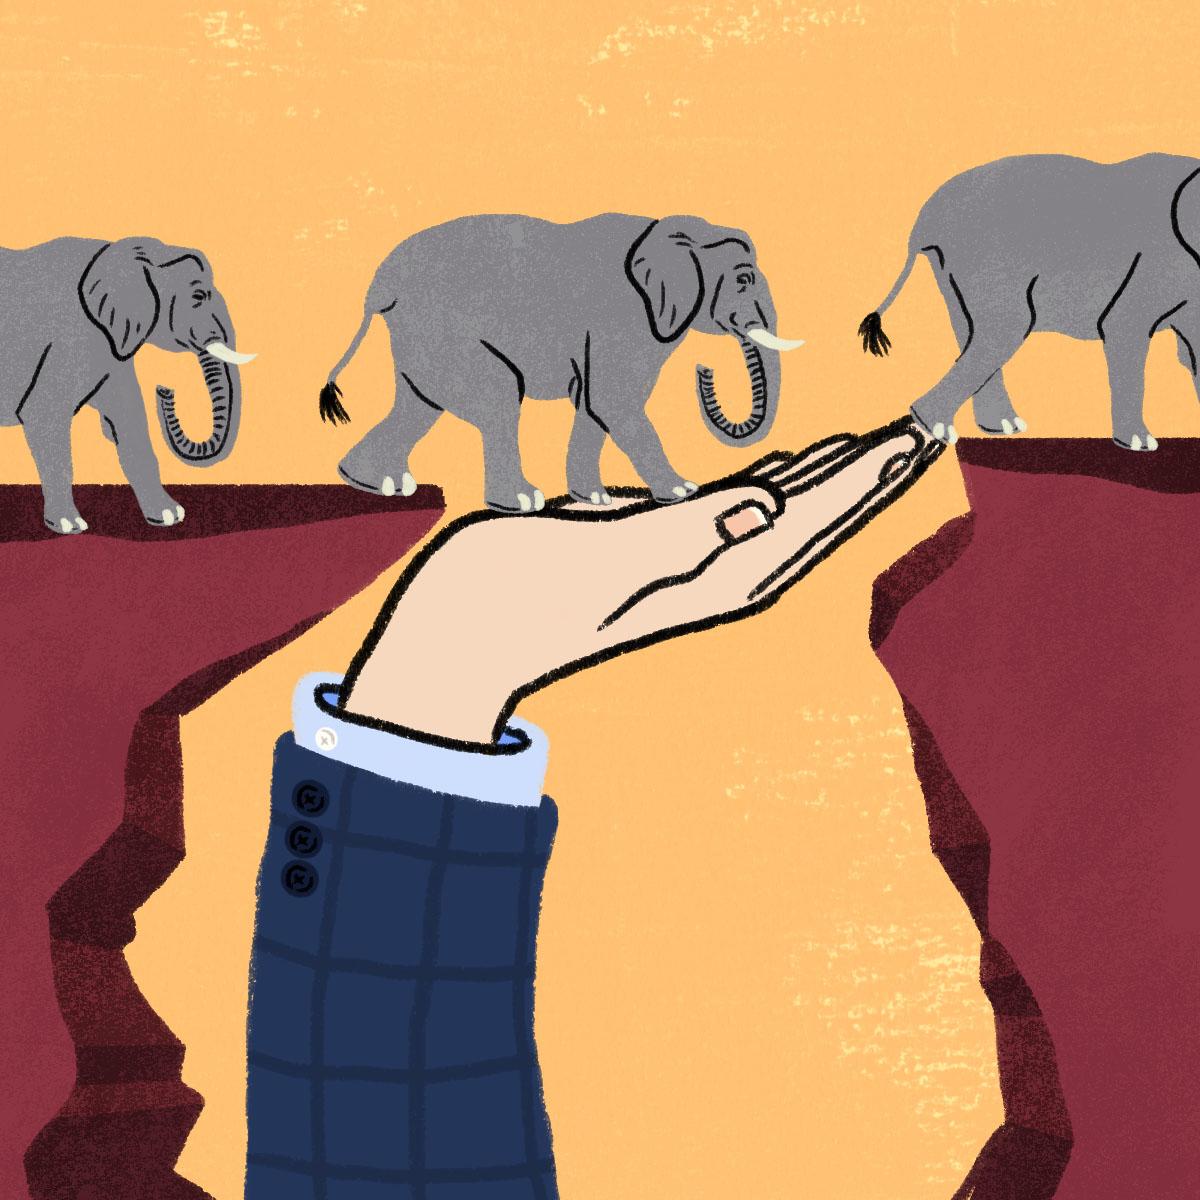 GOP elephants and hand